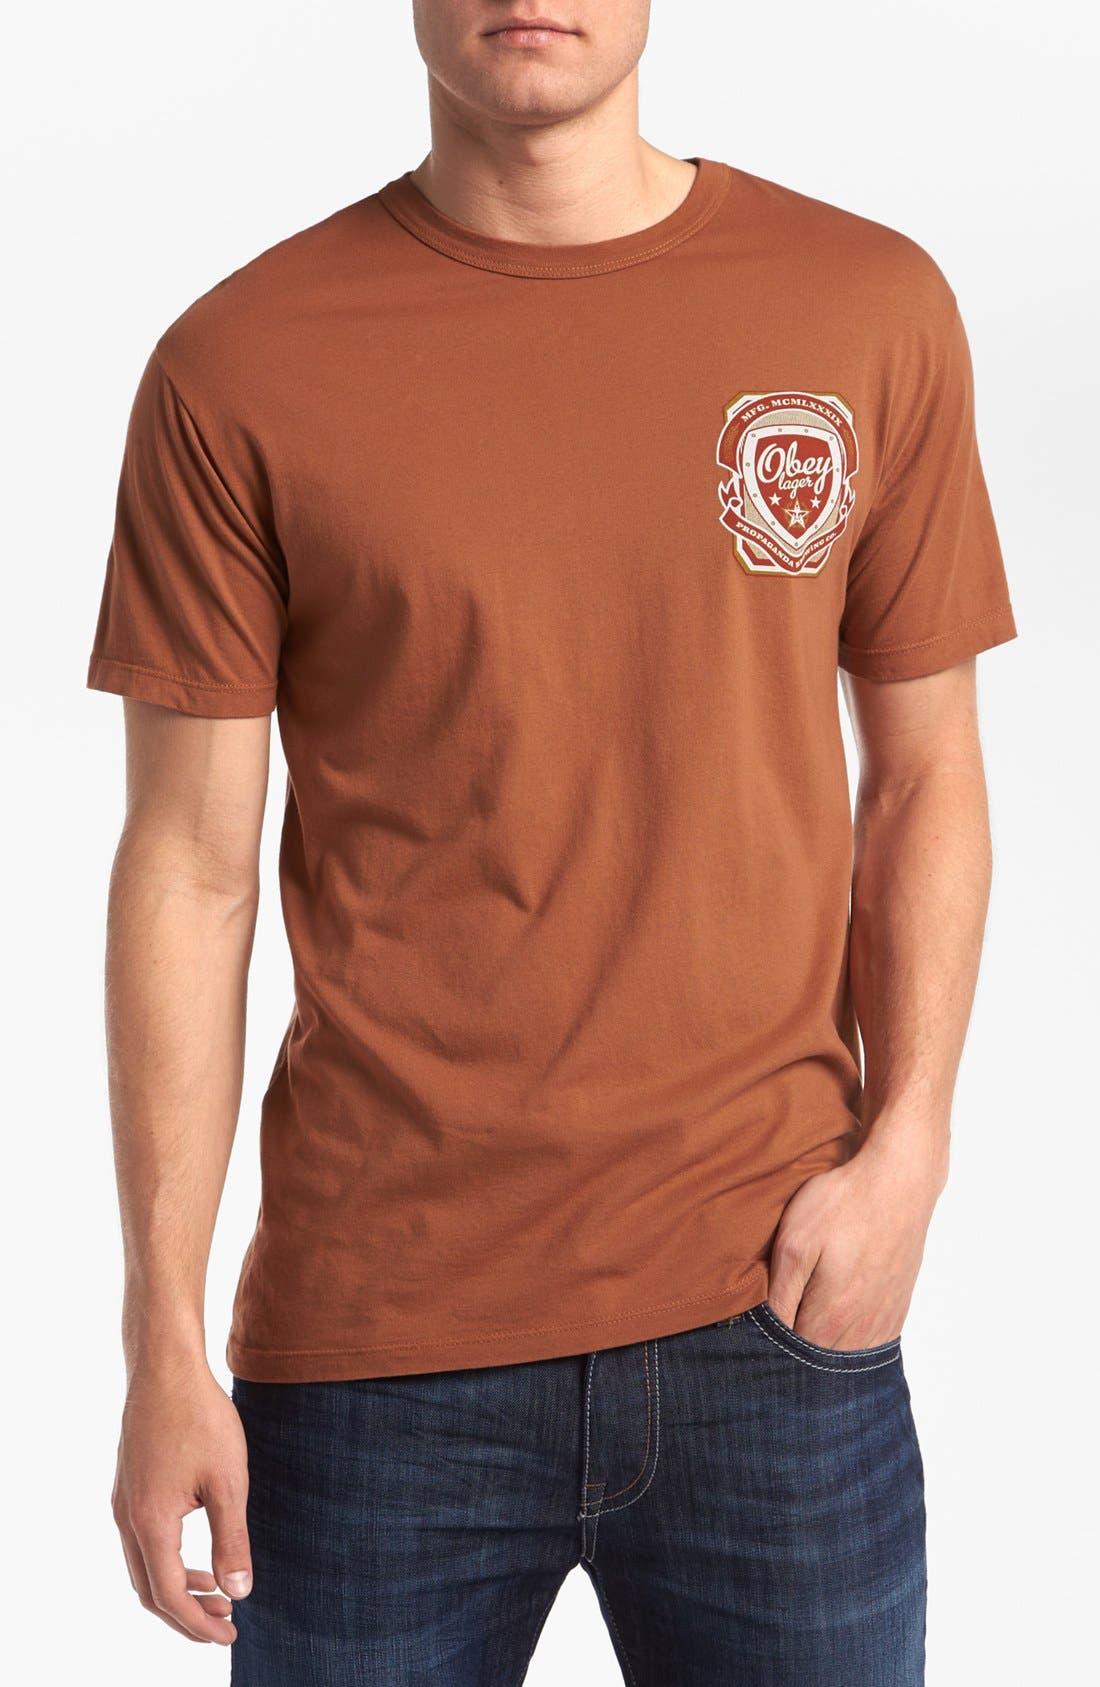 Main Image - Obey 'Propaganda Brewing Co.' T-Shirt